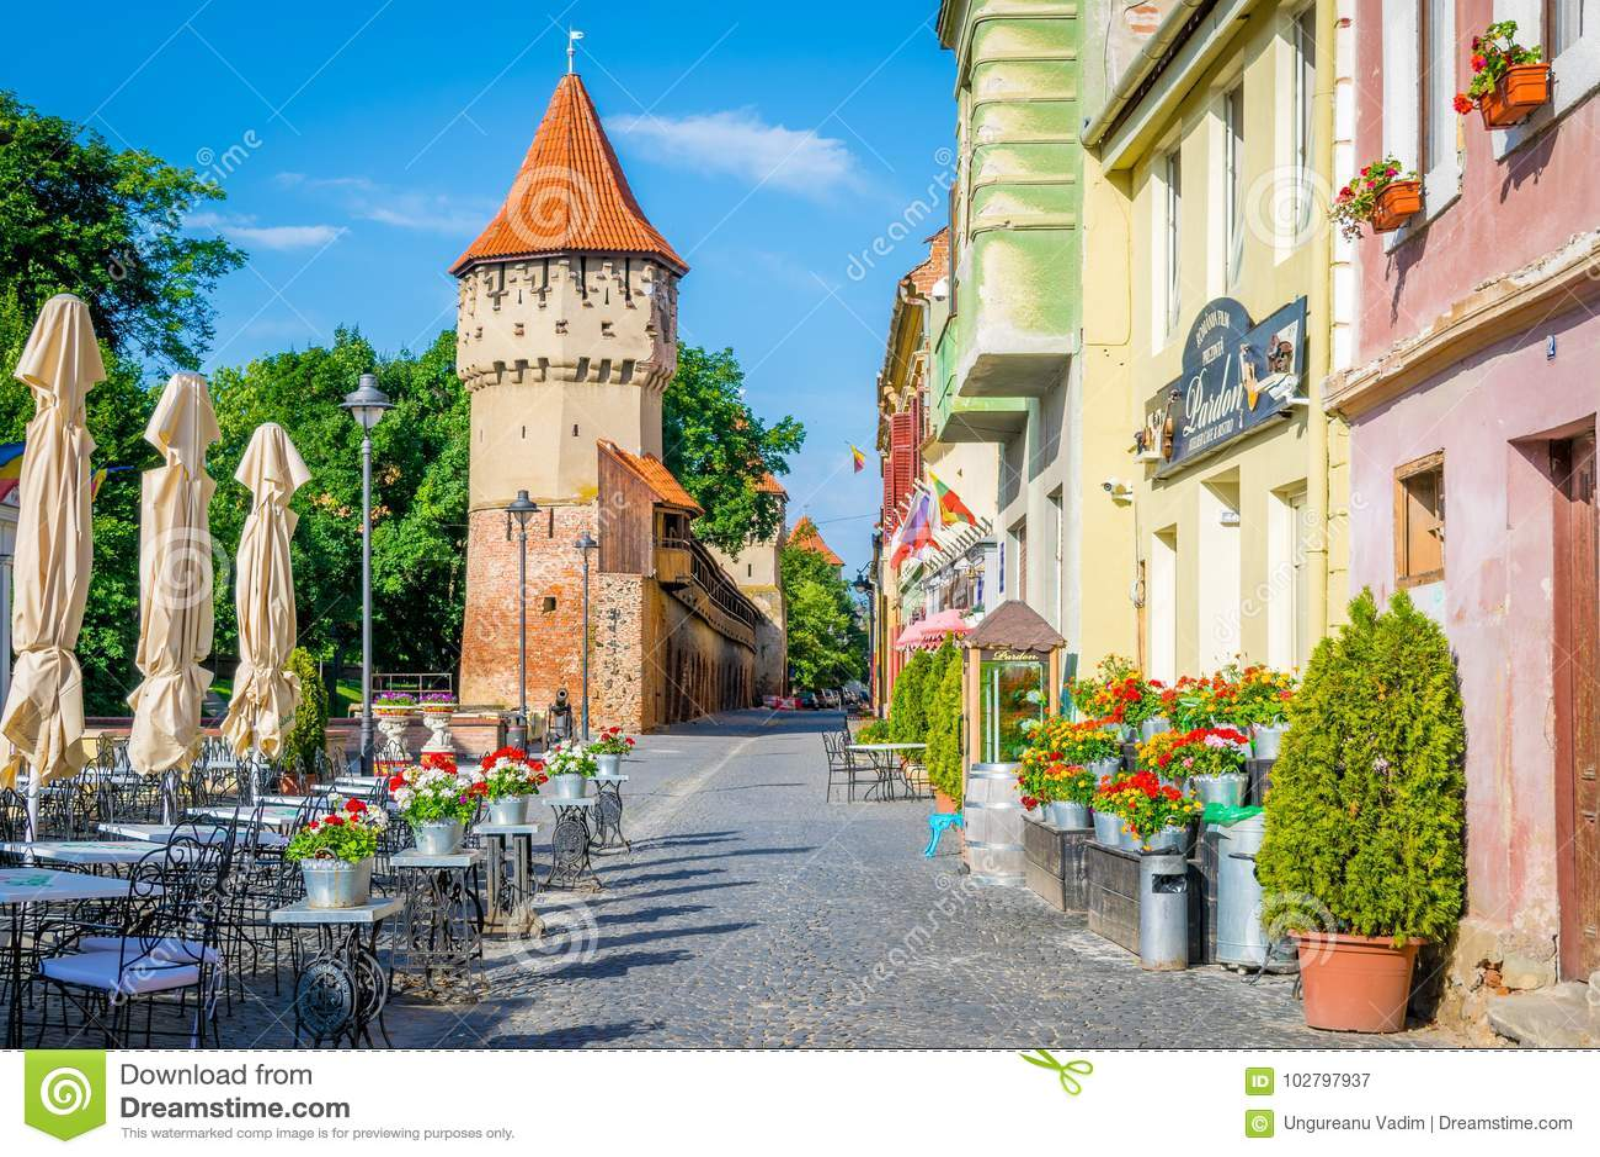 Colorful street in Sibiu in the morning, Transylvania region, Romania